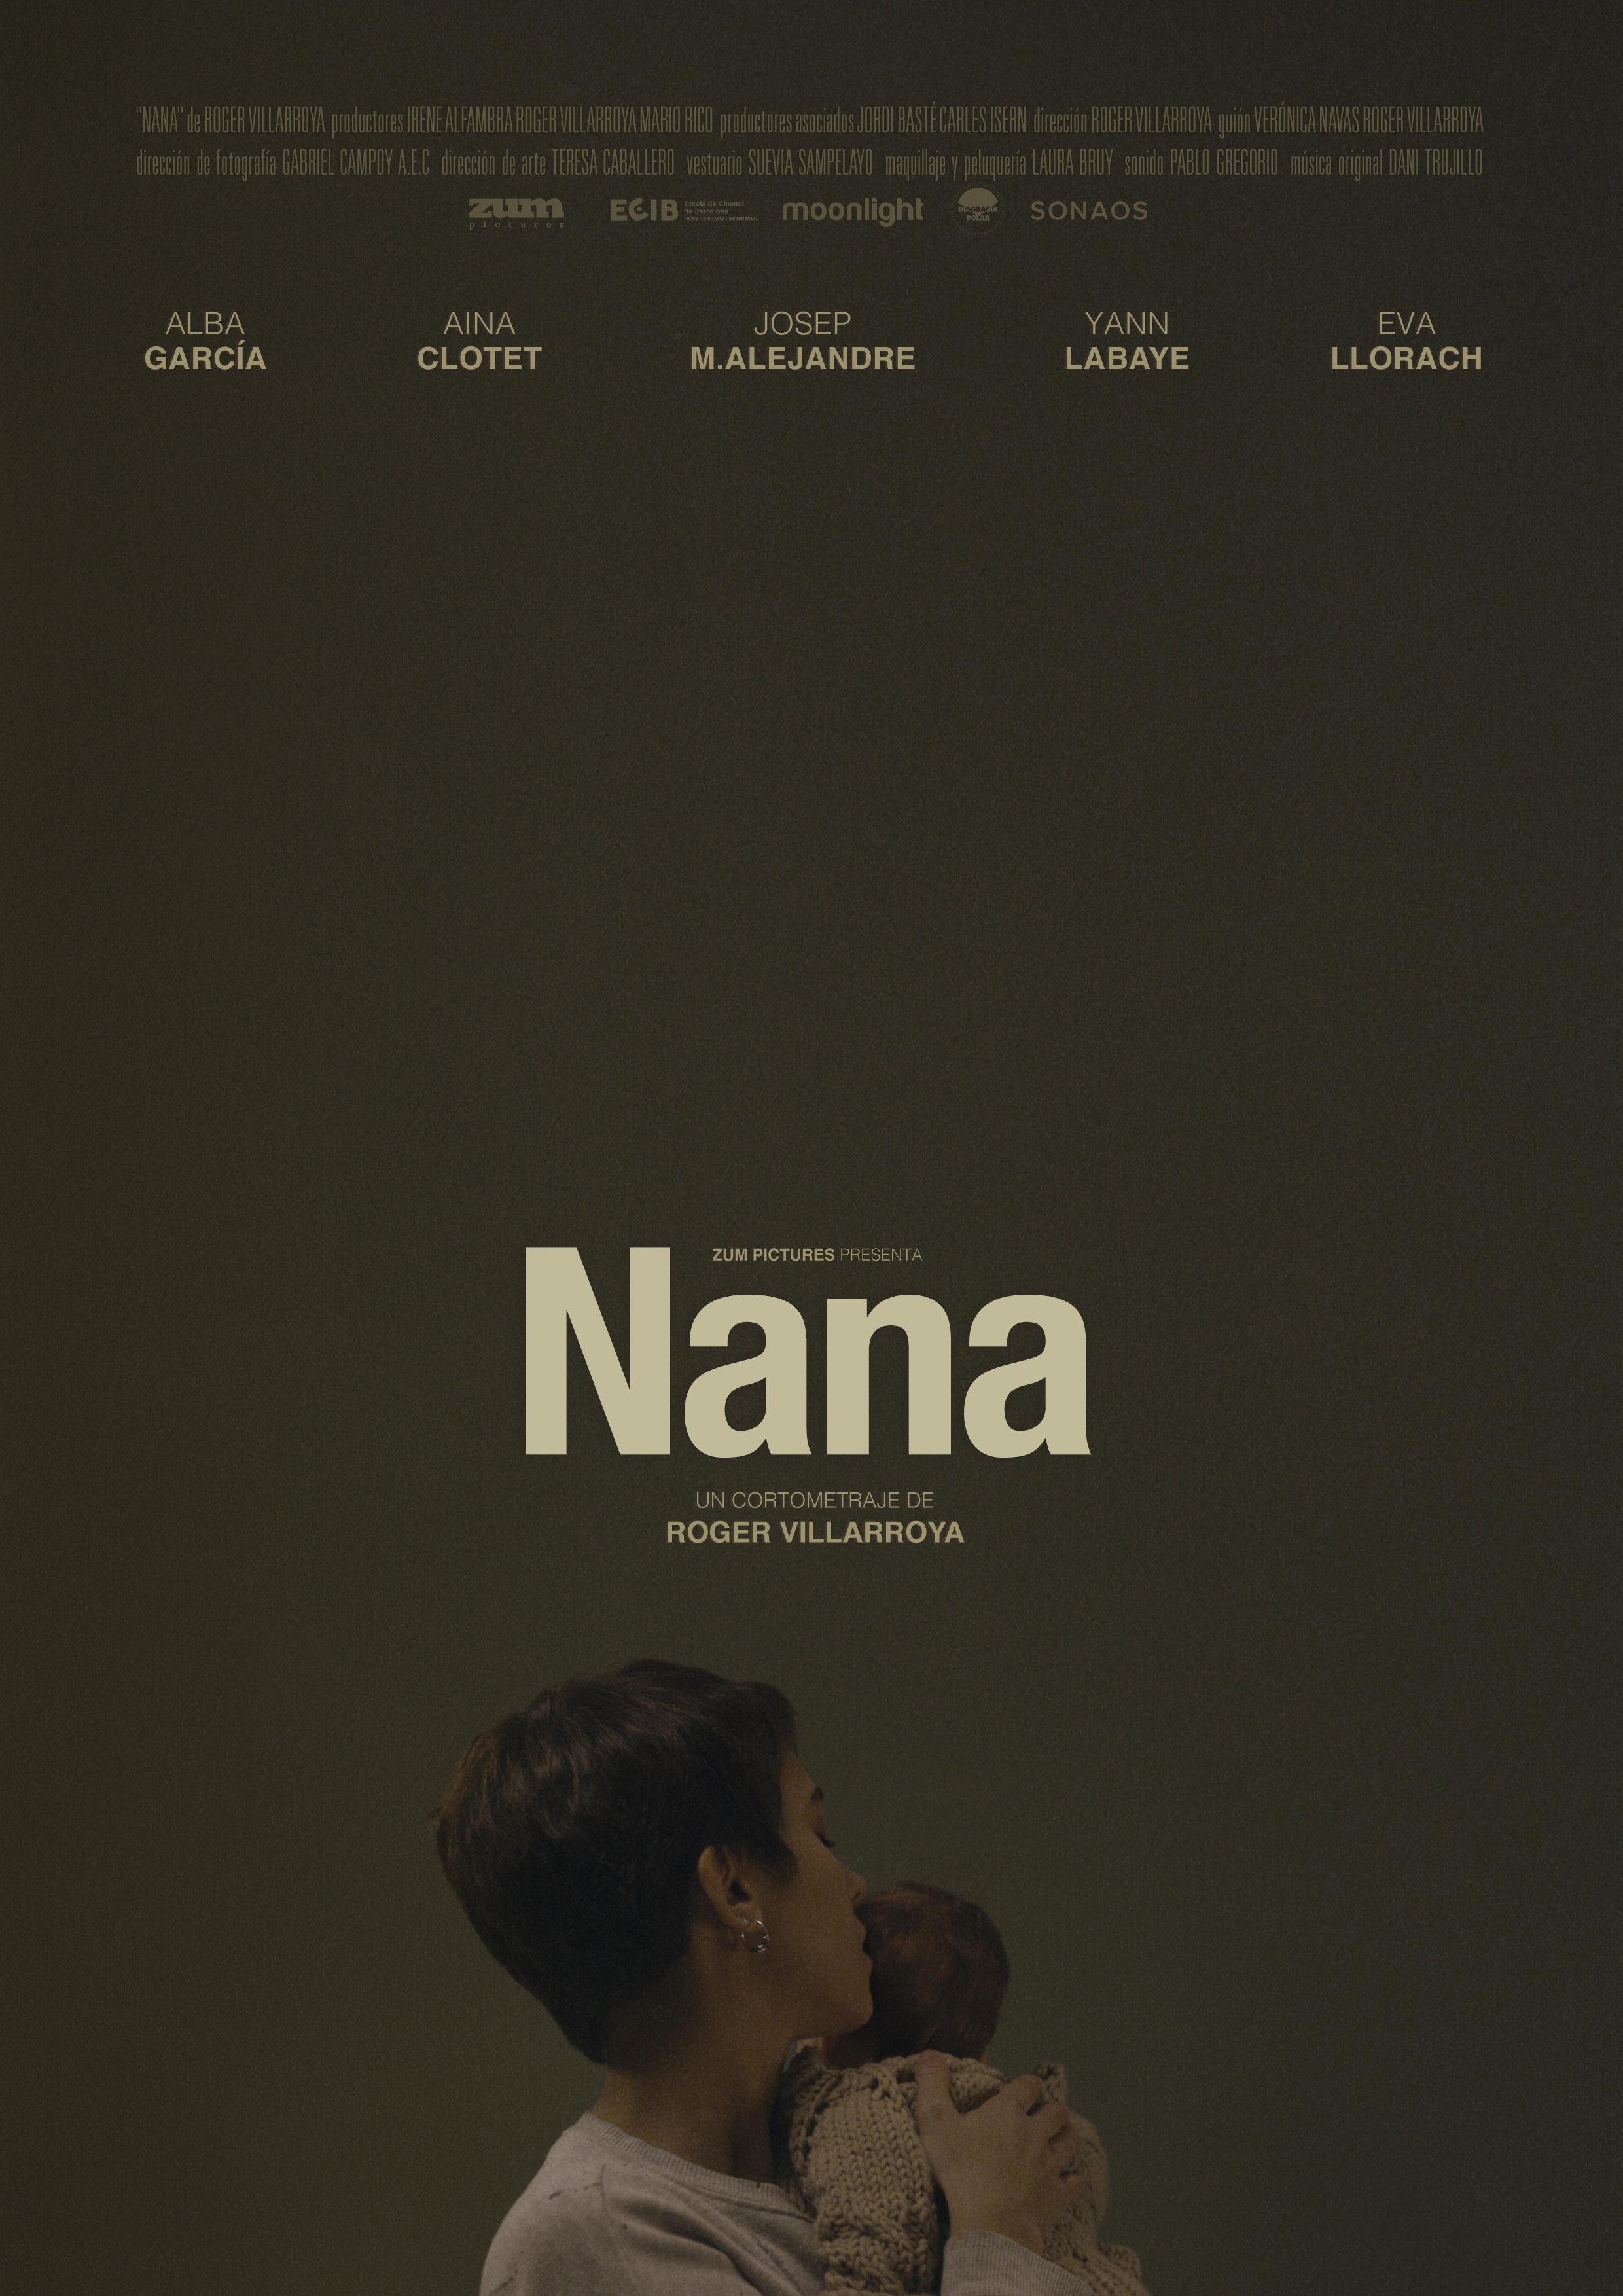 Nana 2019 Imdb